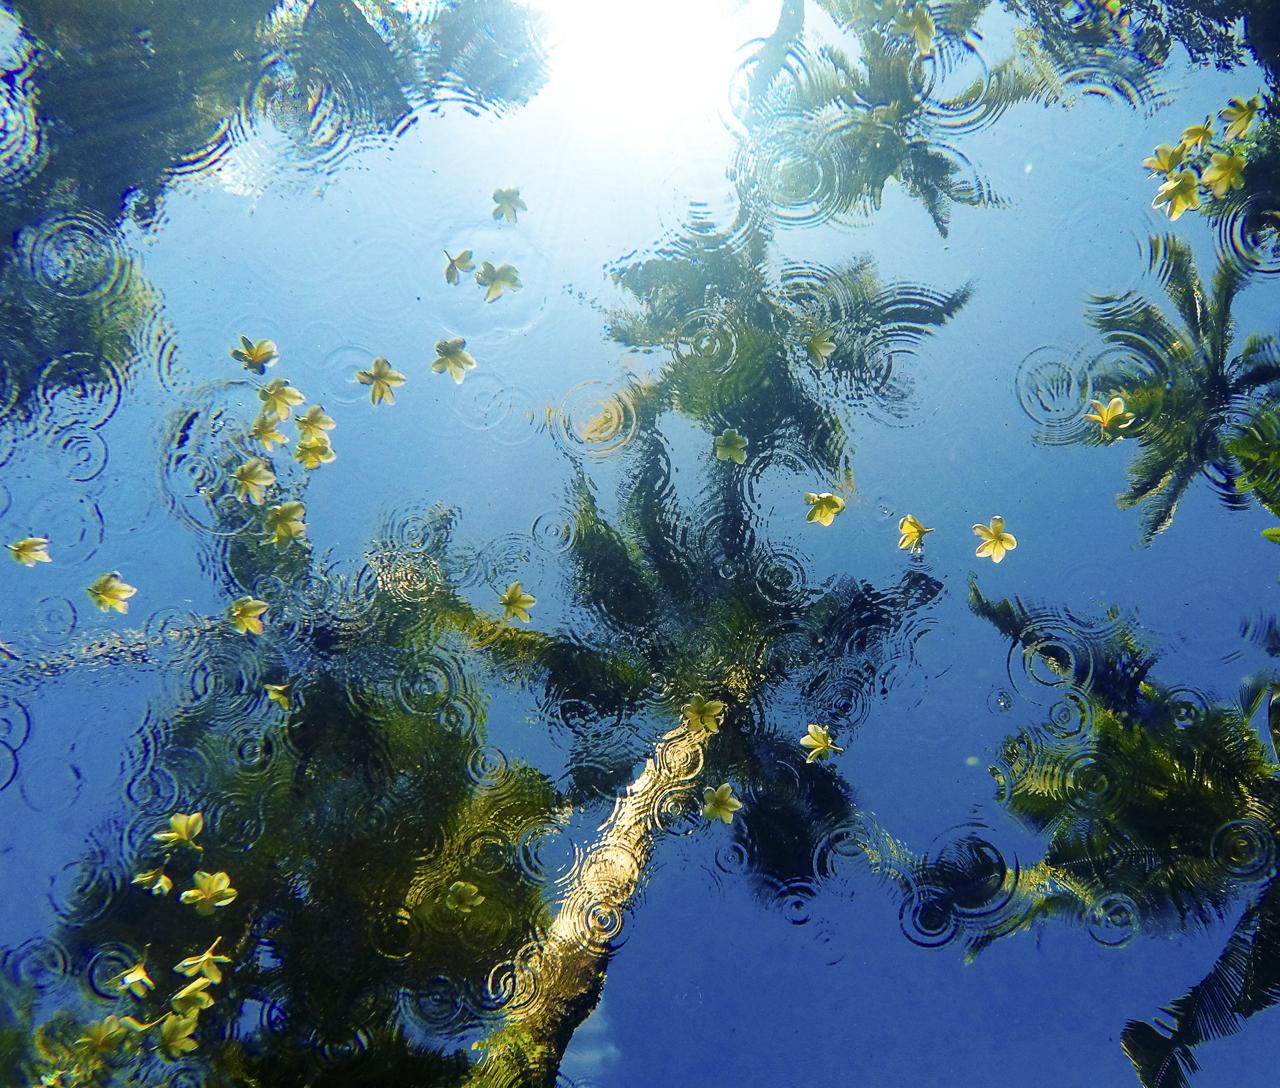 022_Sarah_Lee_Photography_Underwater_.jpg